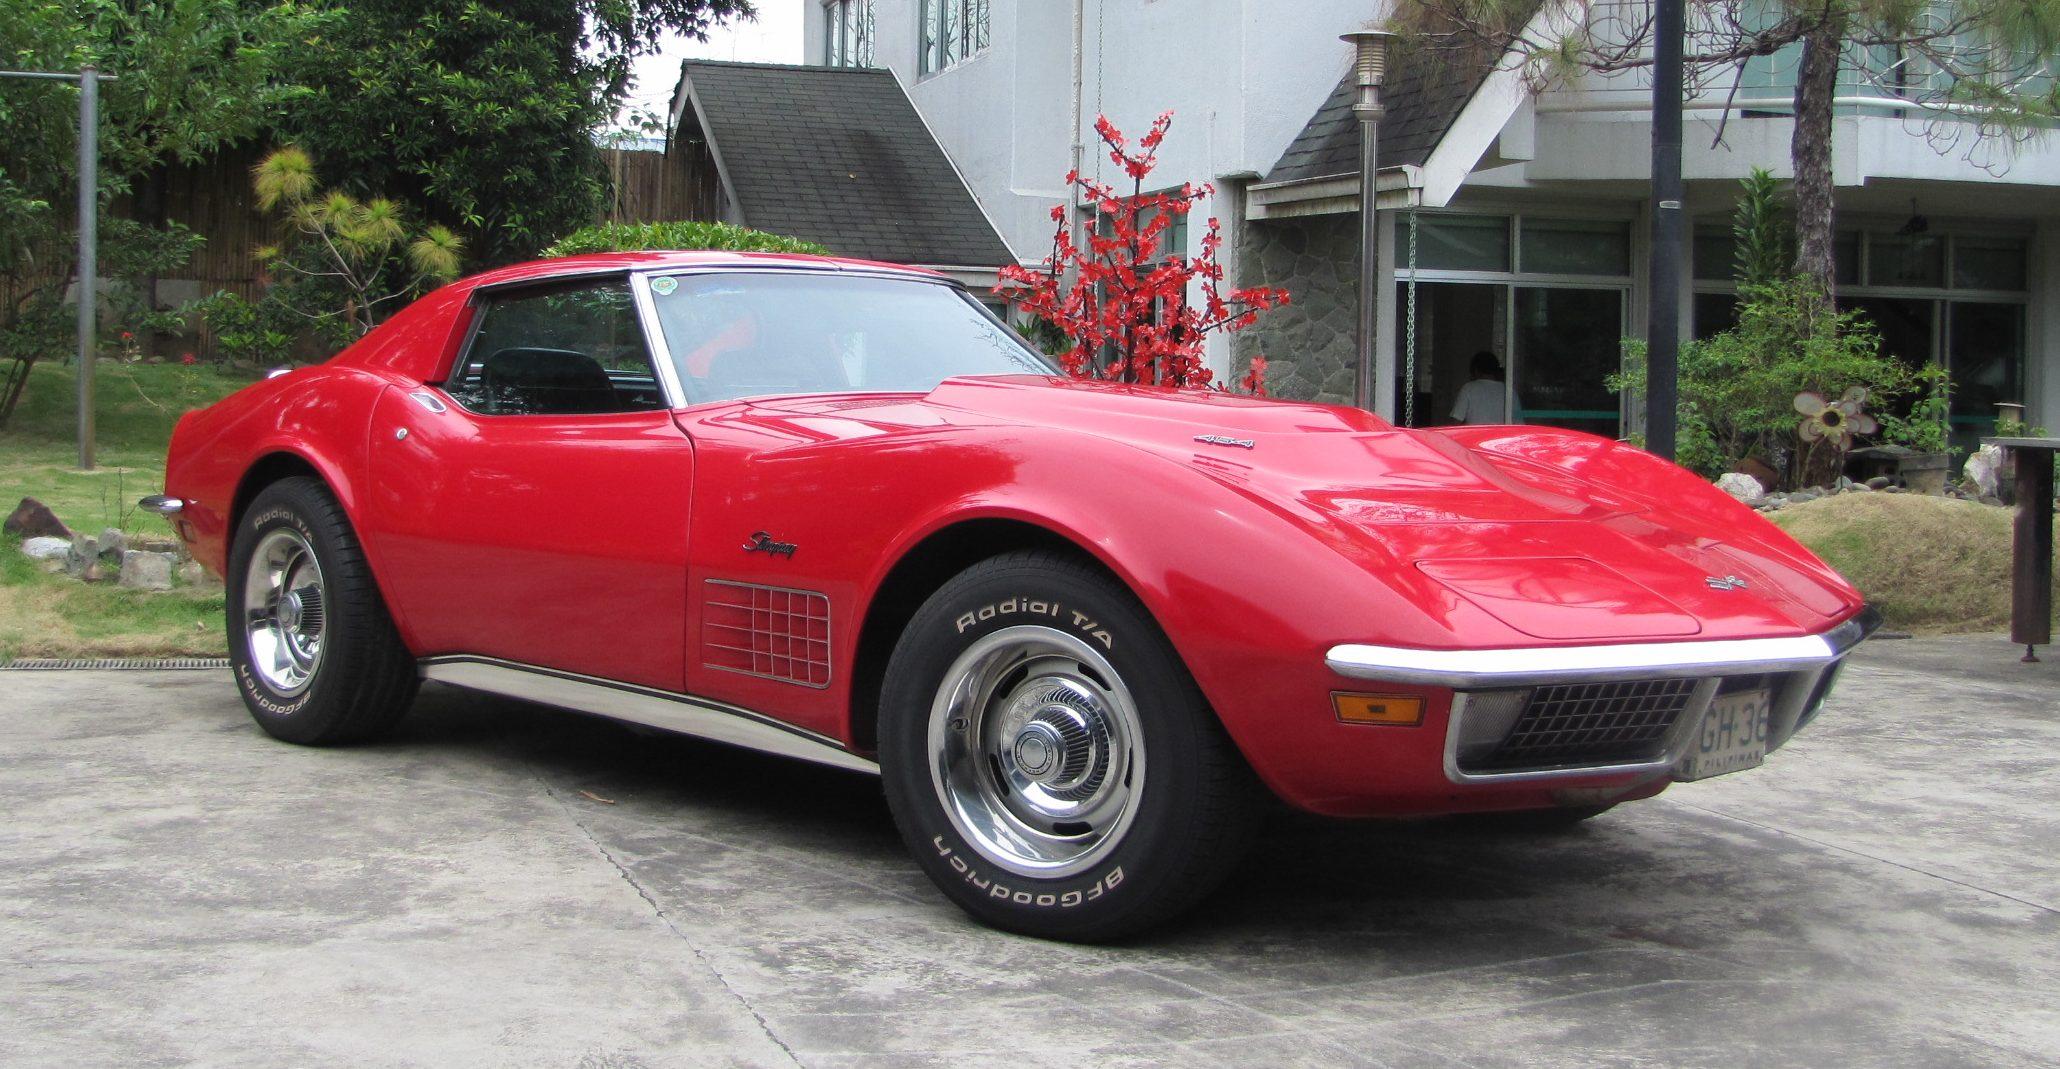 THE AMERICAN SPORTS CAR: A 1970 454 Corvette | Street Talk ...